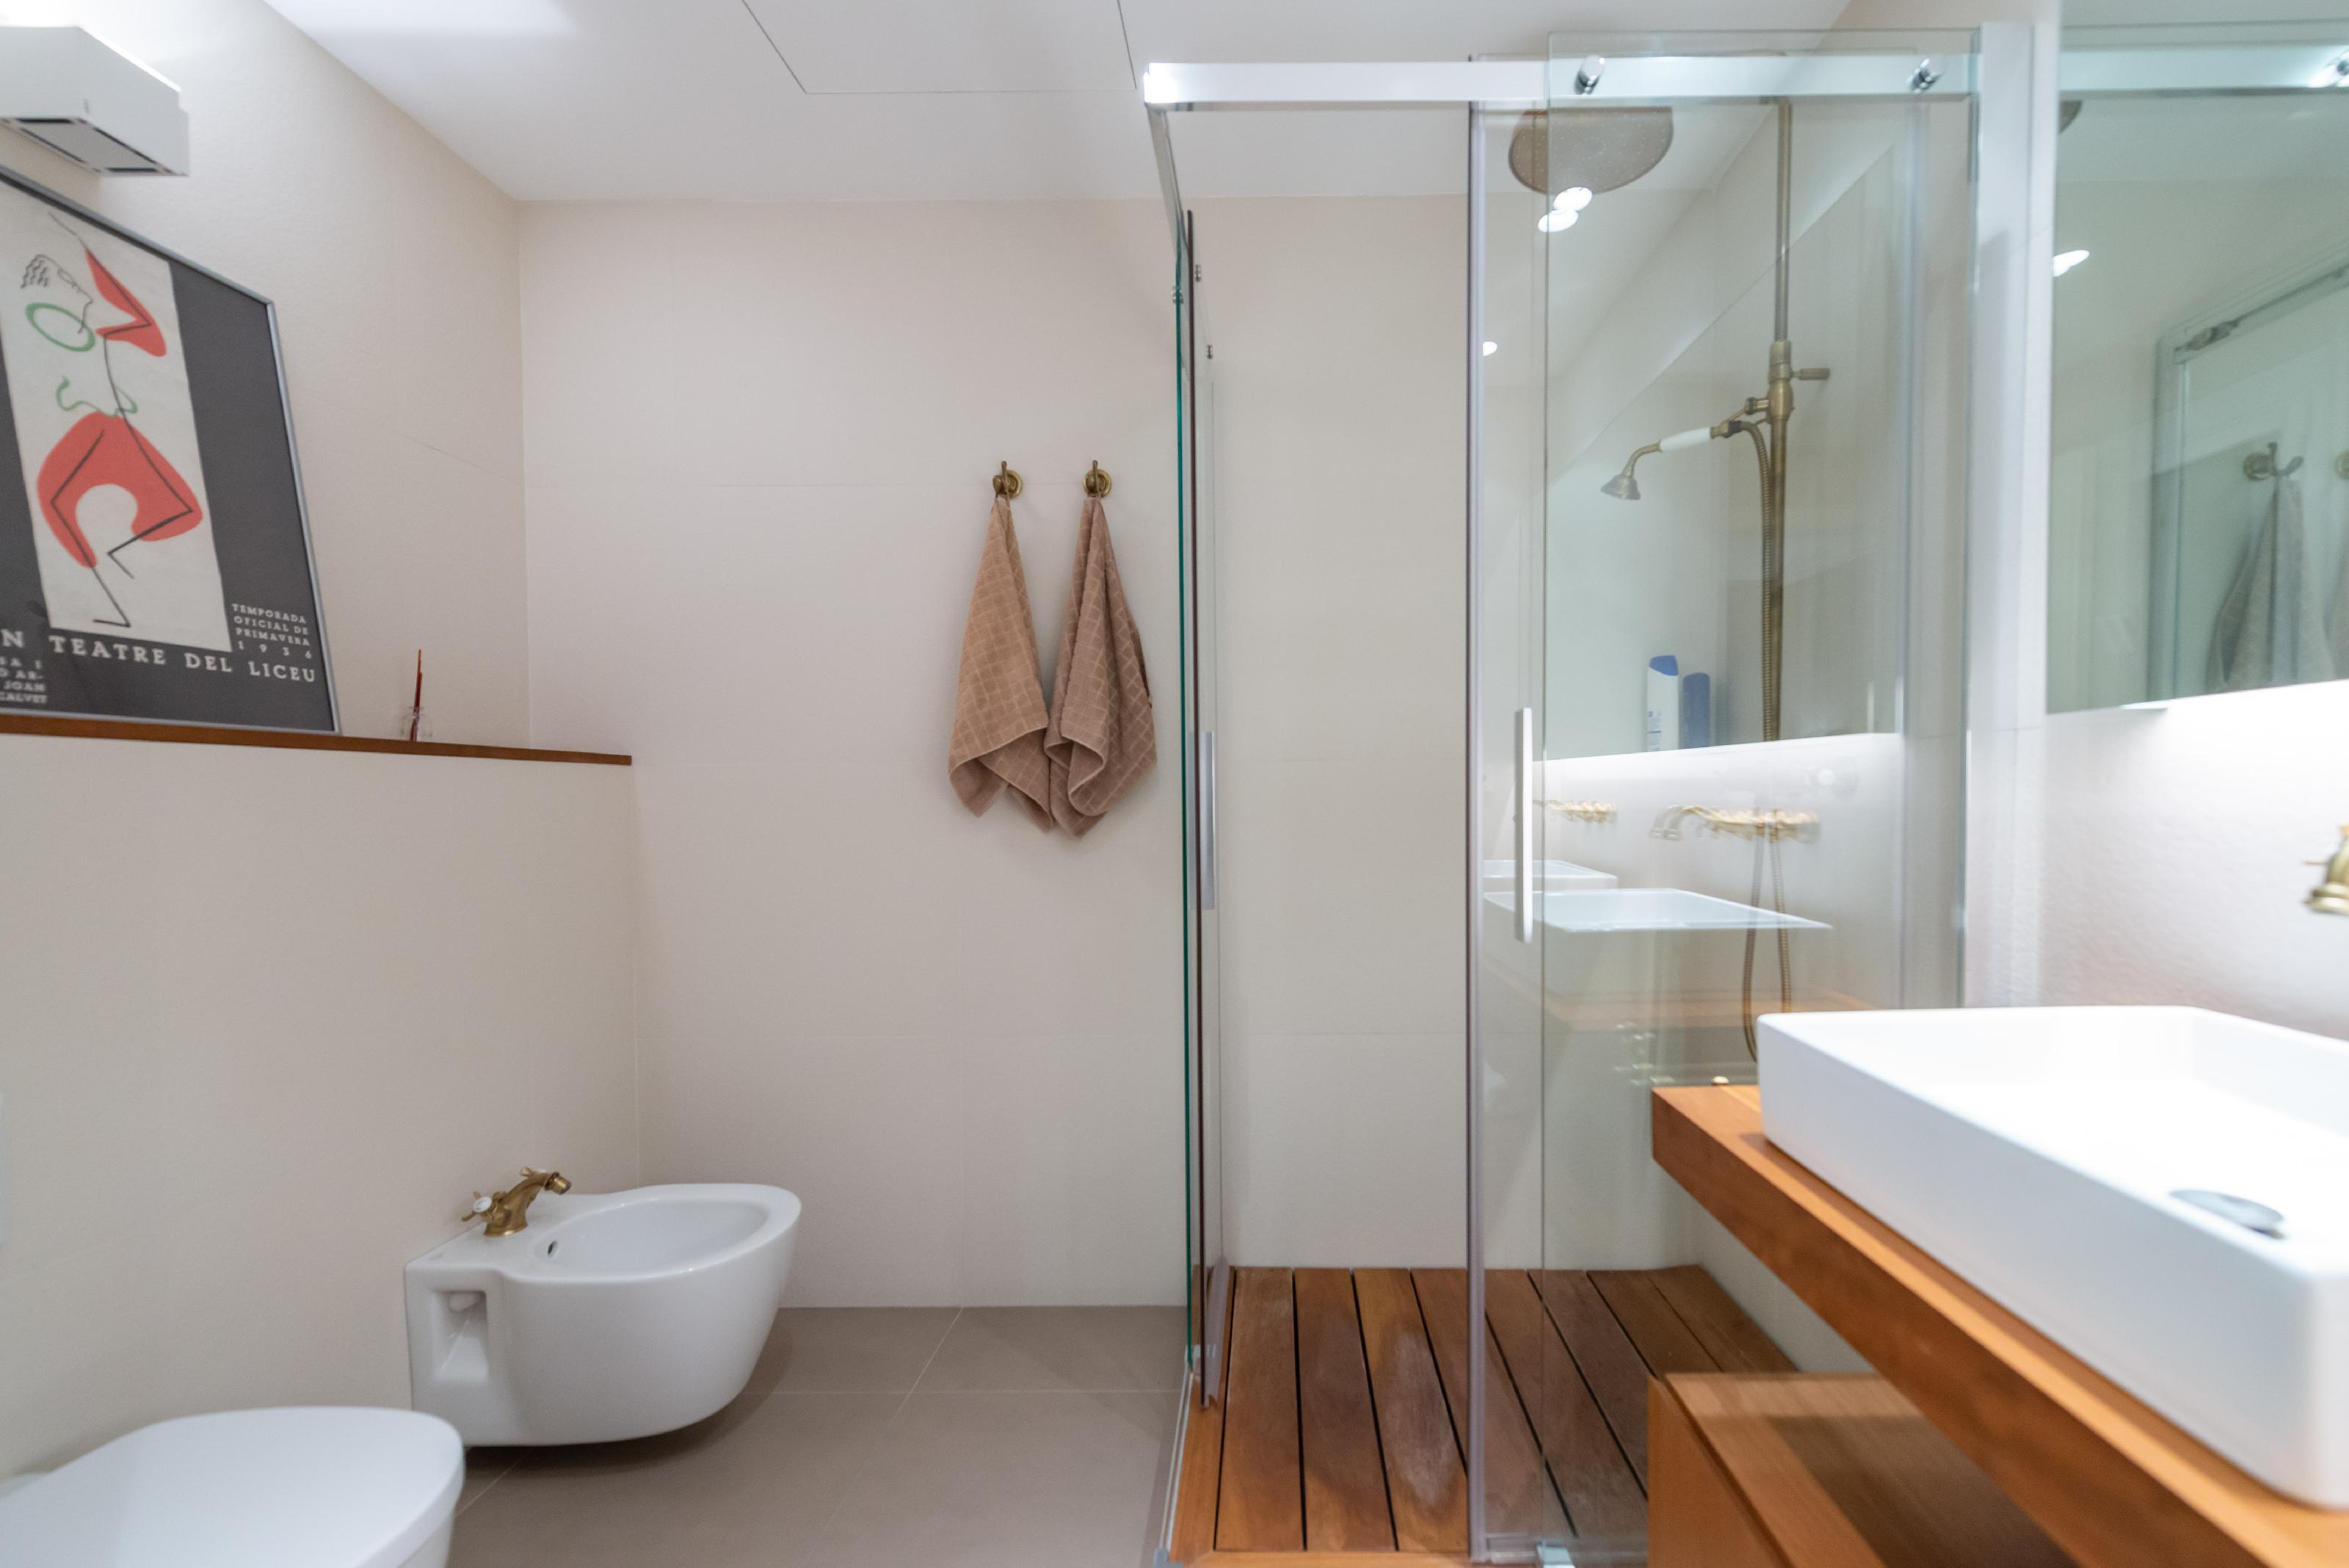 248907 Flat for sale in Sarrià-Sant Gervasi, Sant Gervasi-Galvany 27